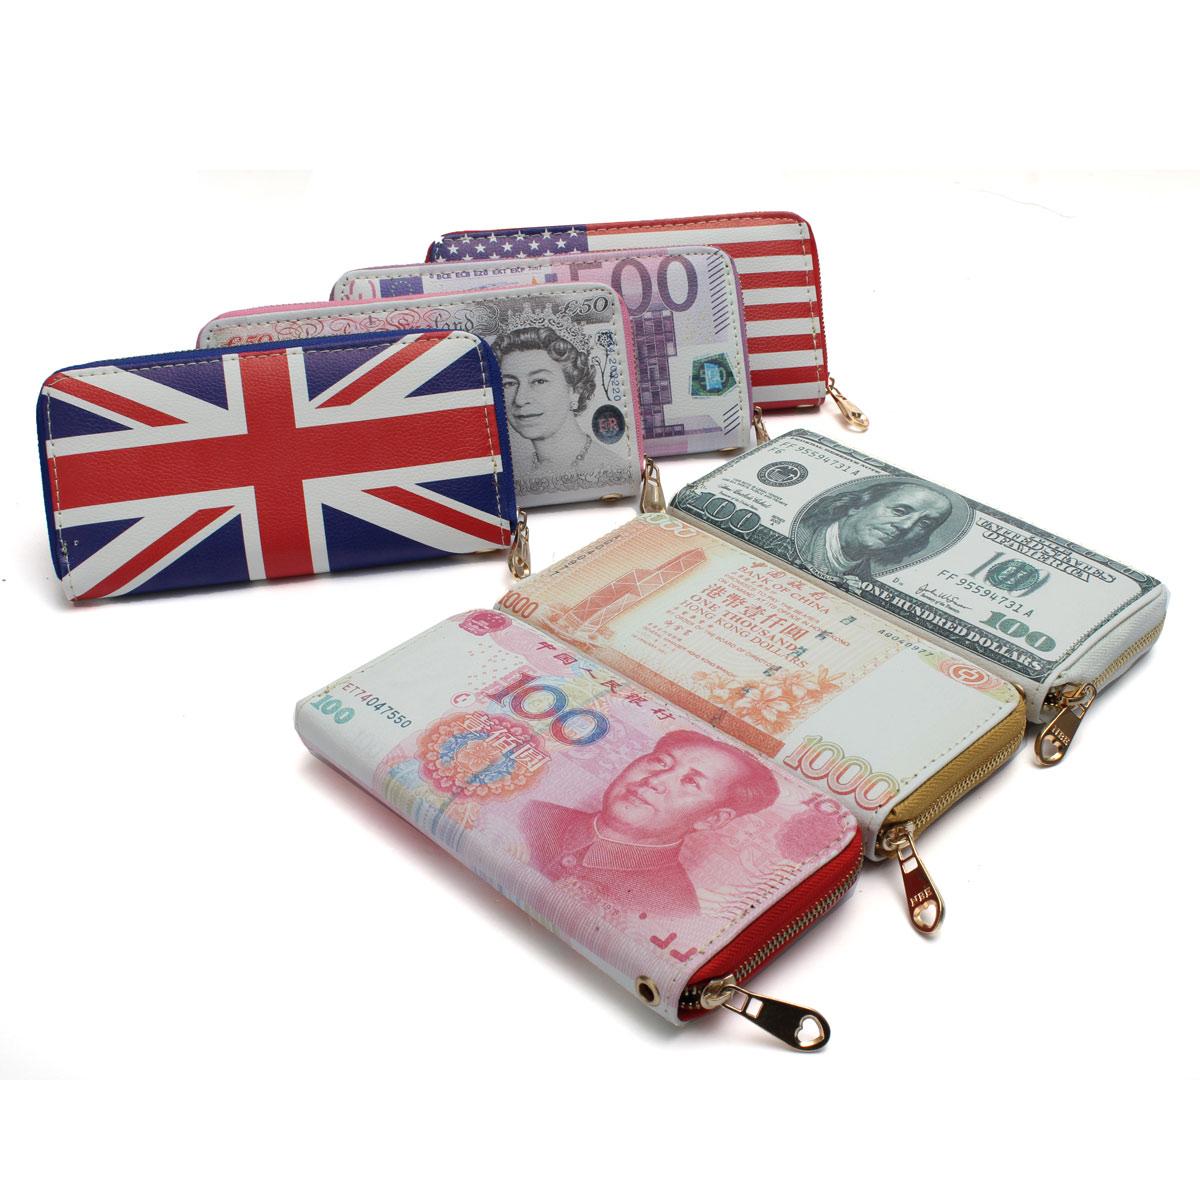 NO 2015 ID Wallets no 2015 id wallets